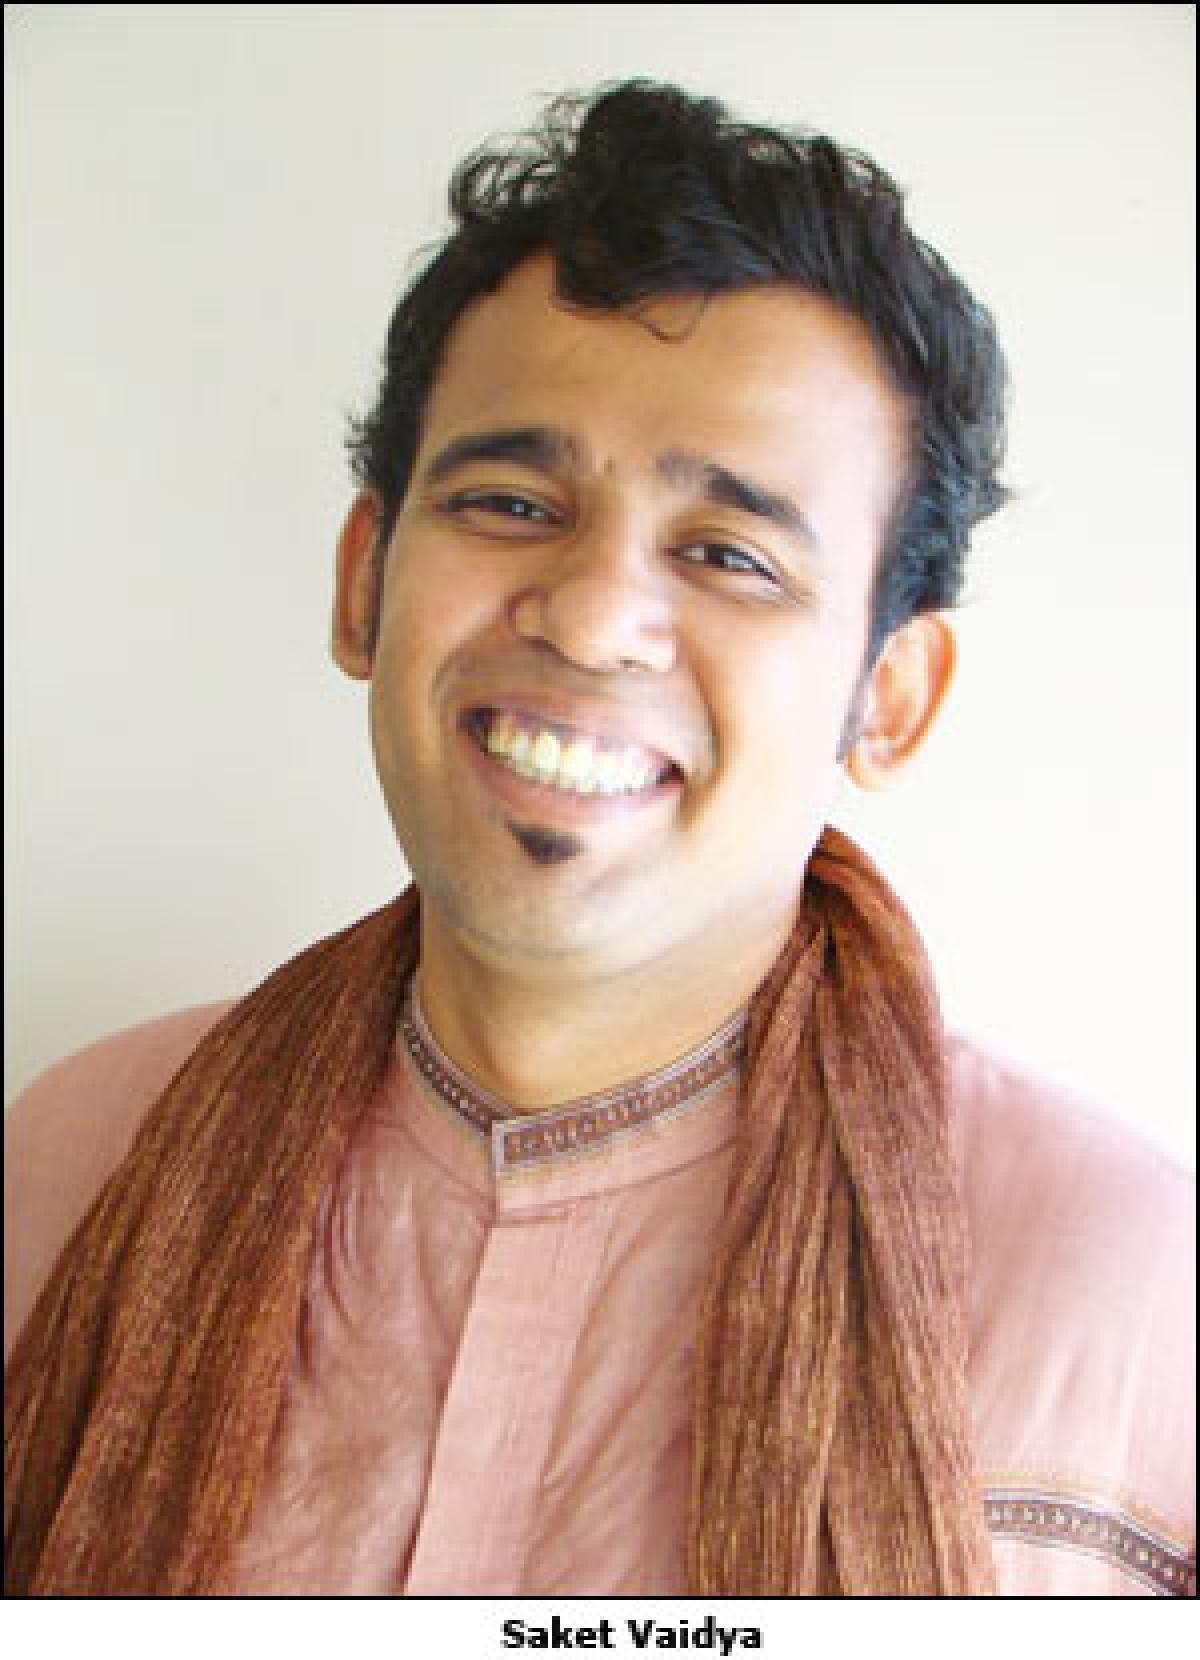 Saket Vaidya quits Webchutney, joins Indigo Consulting